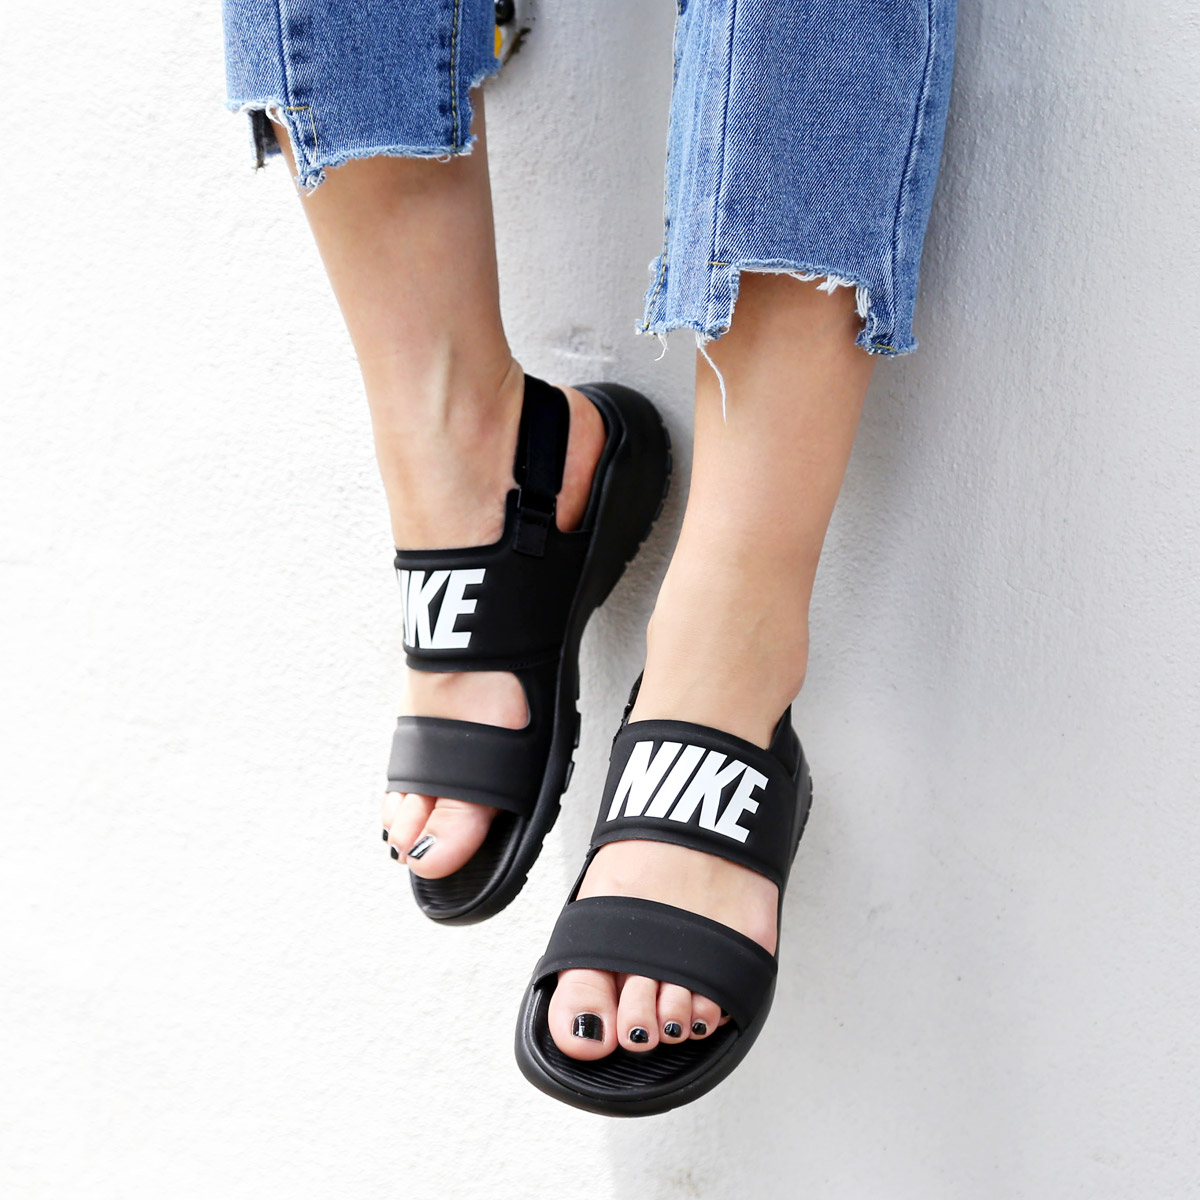 8fdf85ccccaa NIKE WMNS TANJUN SANDAL (Nike women tongue Jun sandals) BLACK WHITE-BLACK  17SU-I